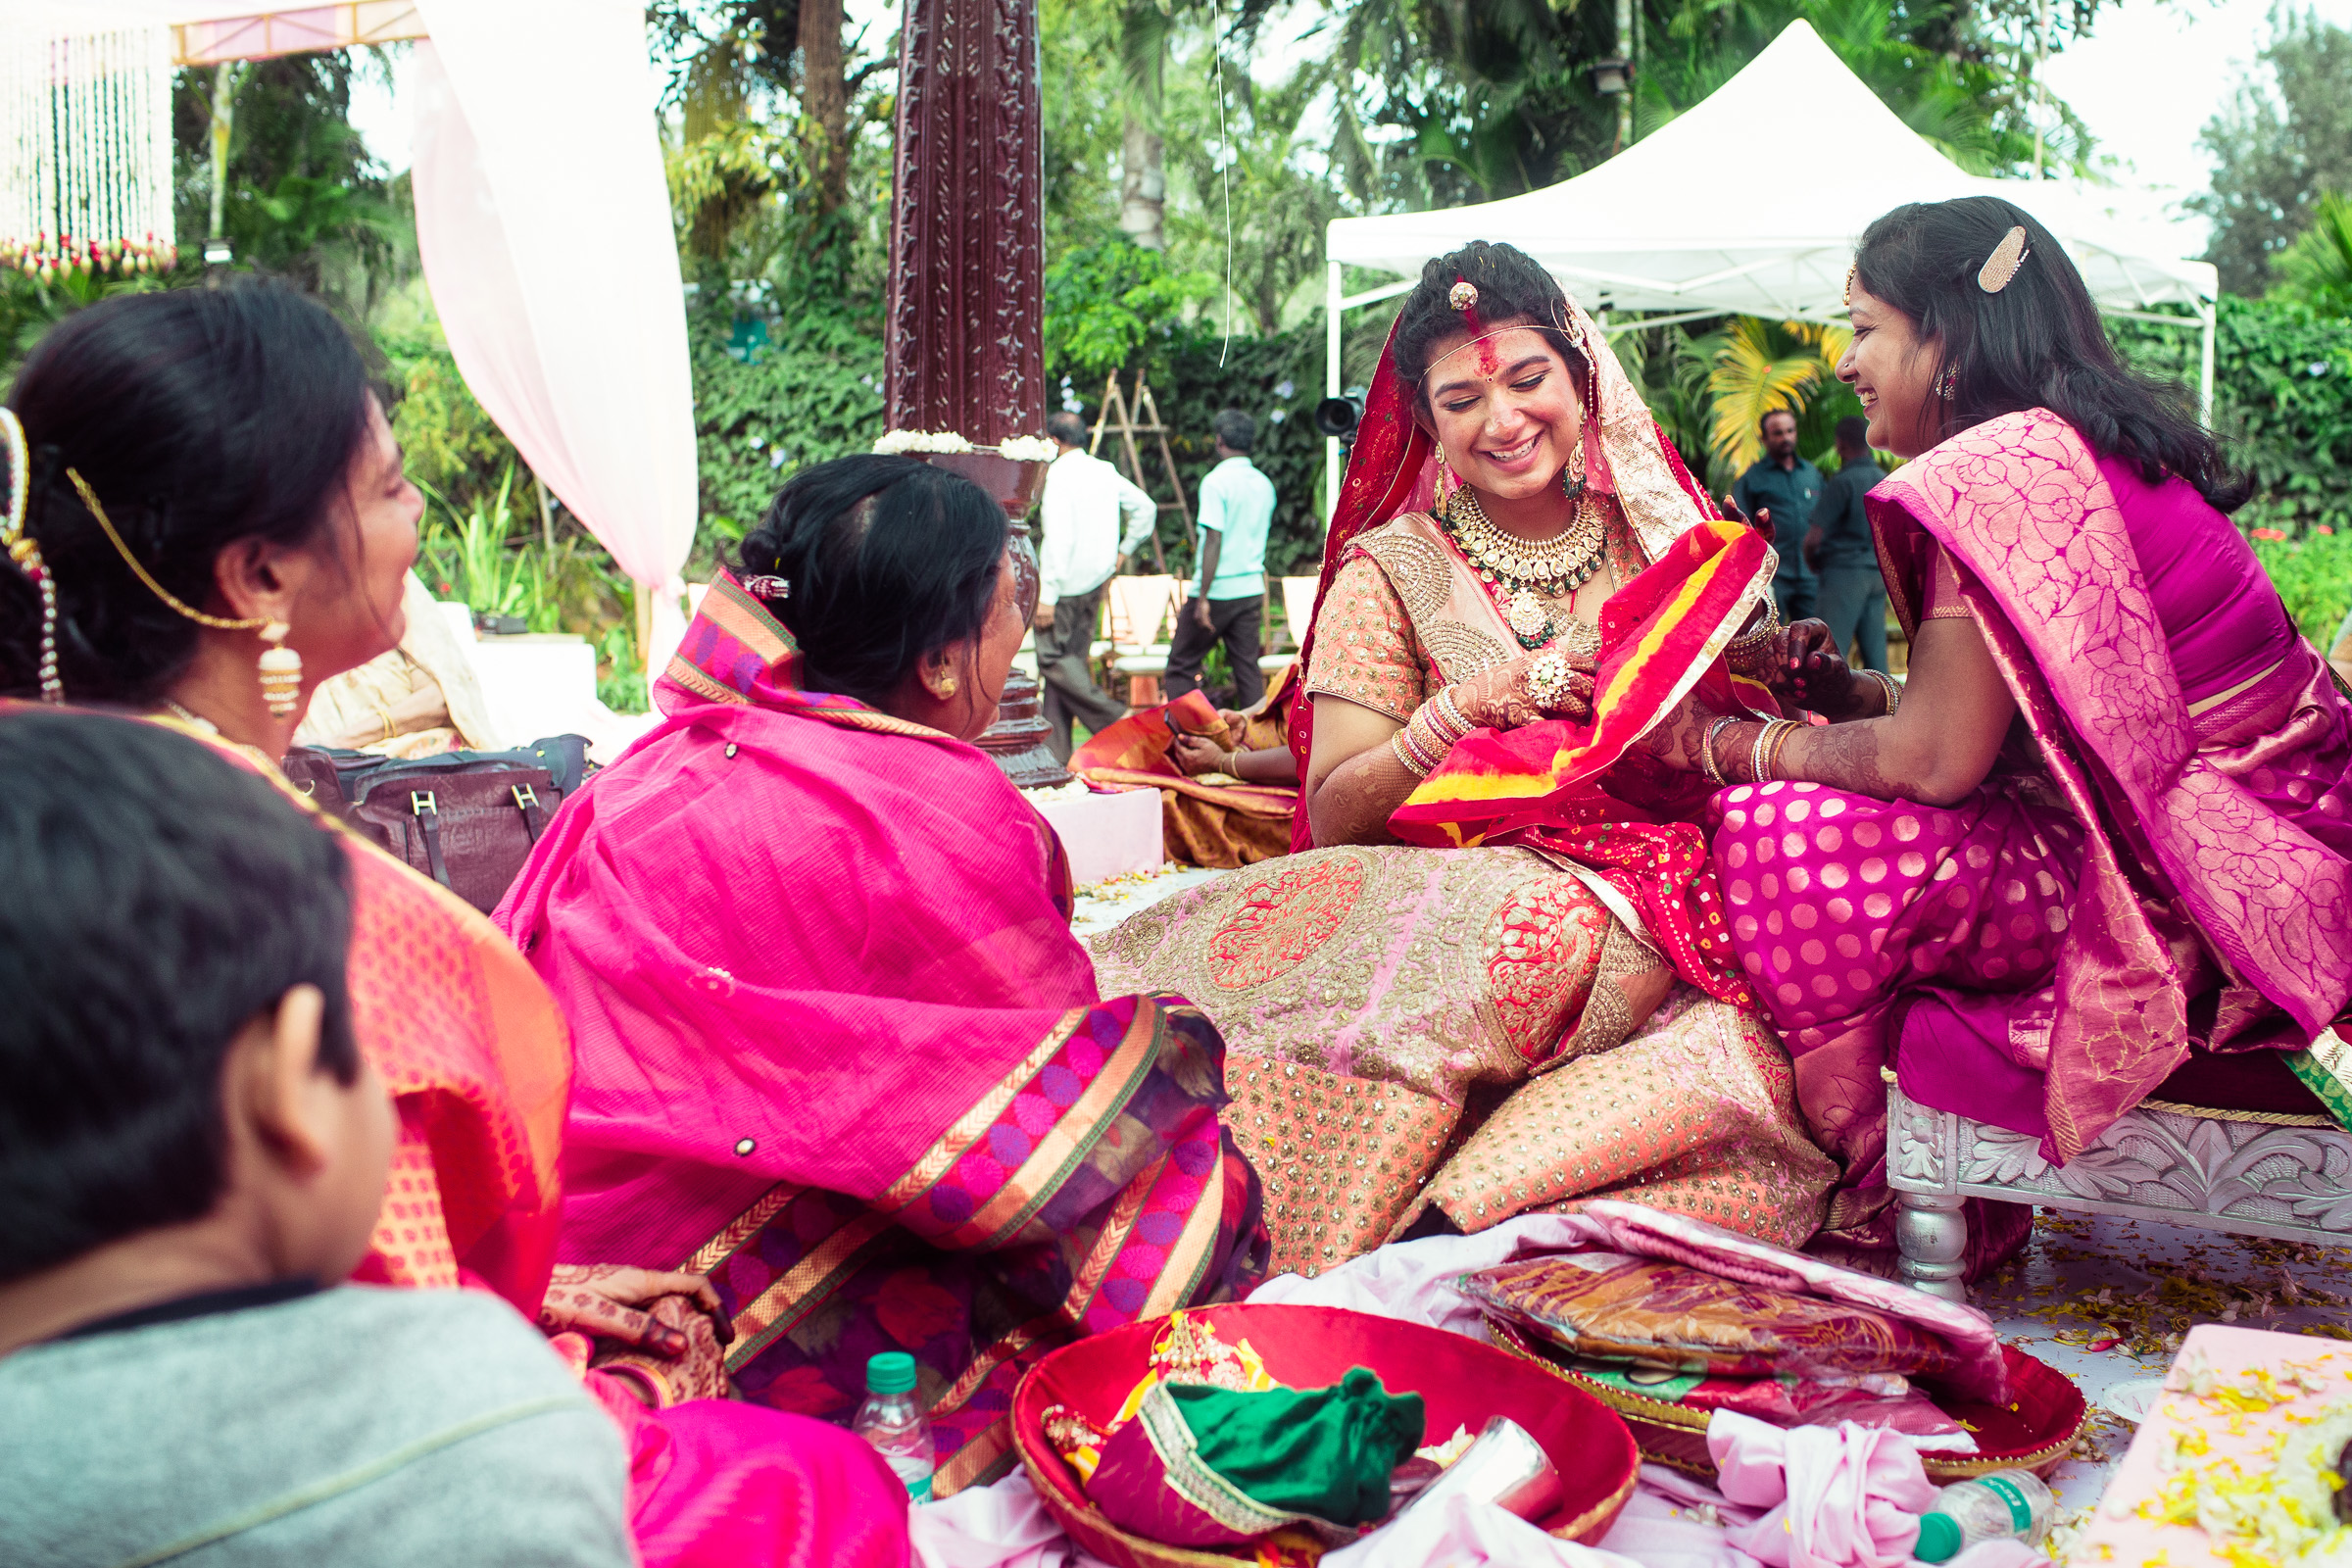 marwari-candid-wedding-photographers-bangalore-0048.jpg